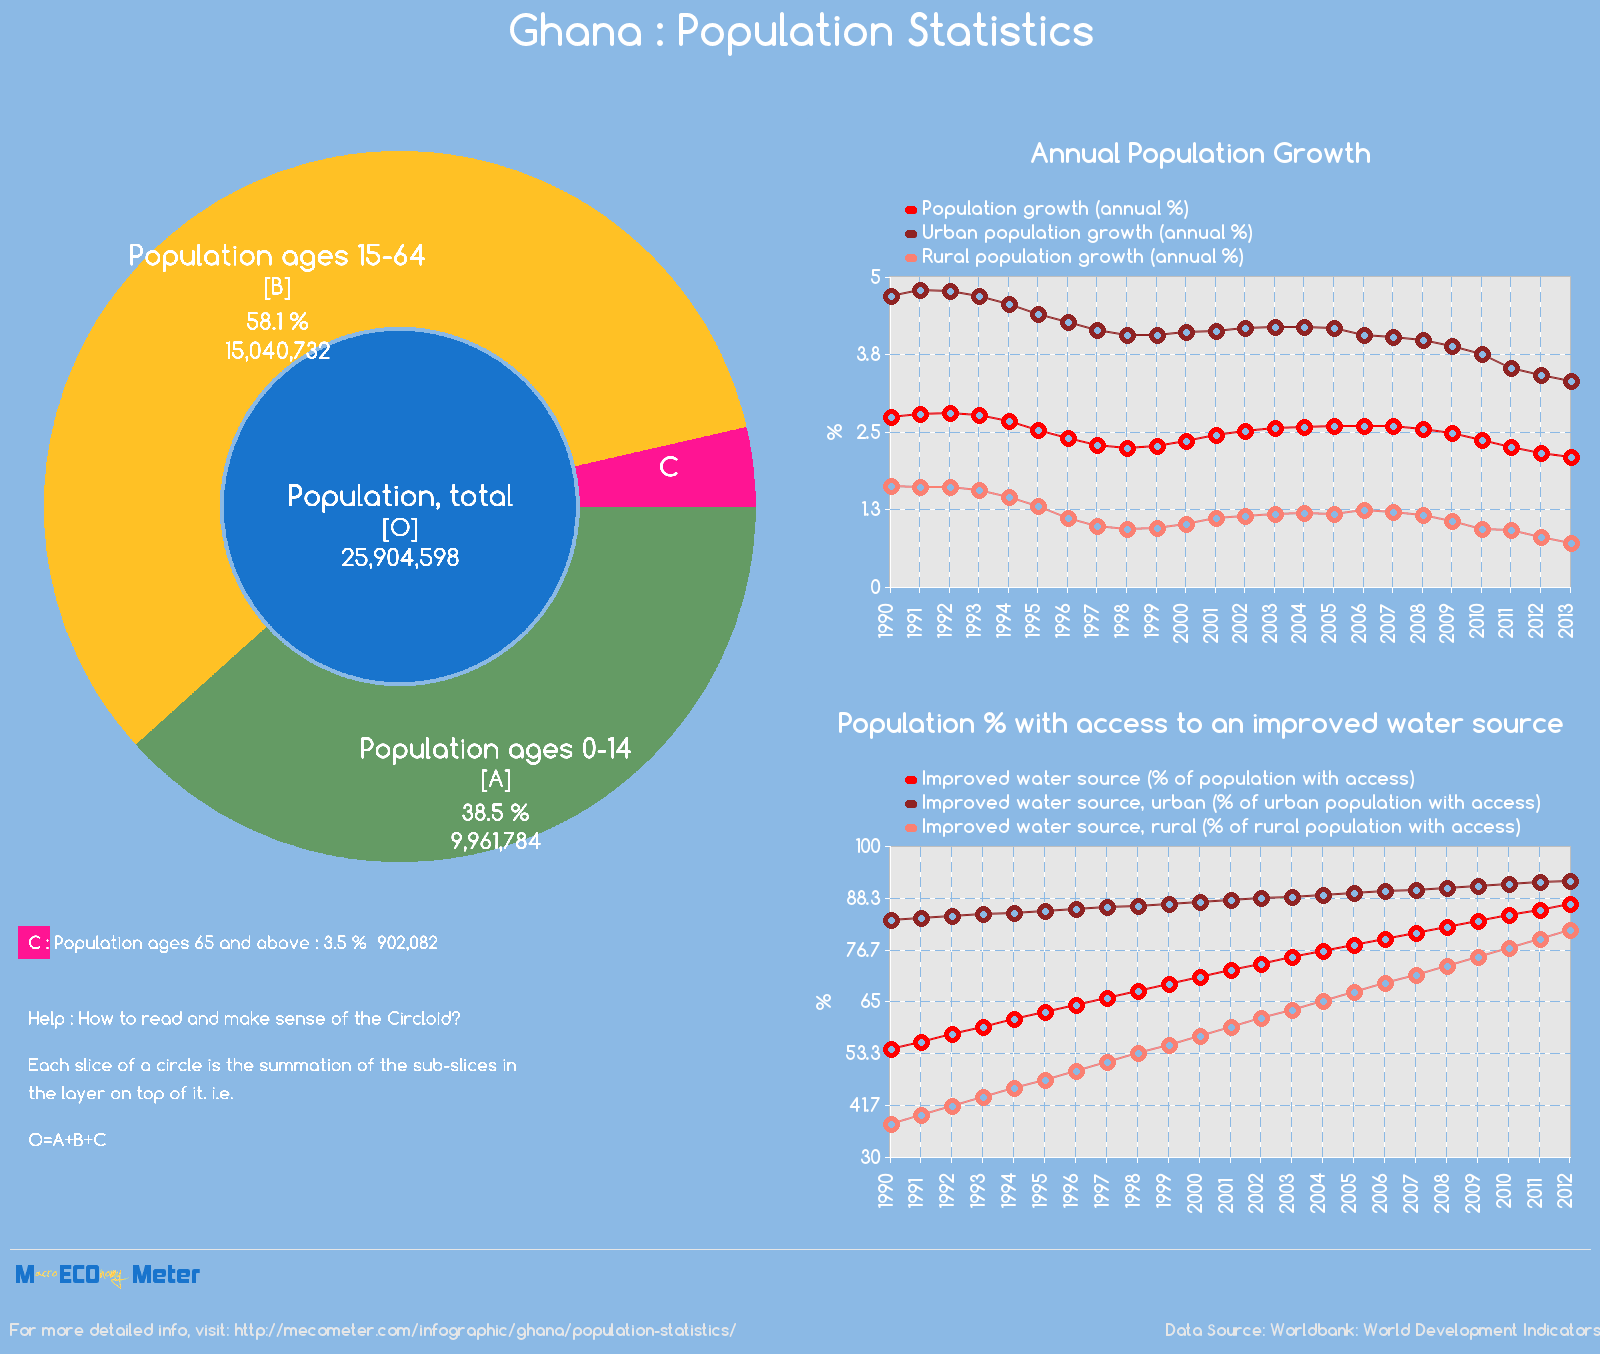 Ghana : Population Statistics